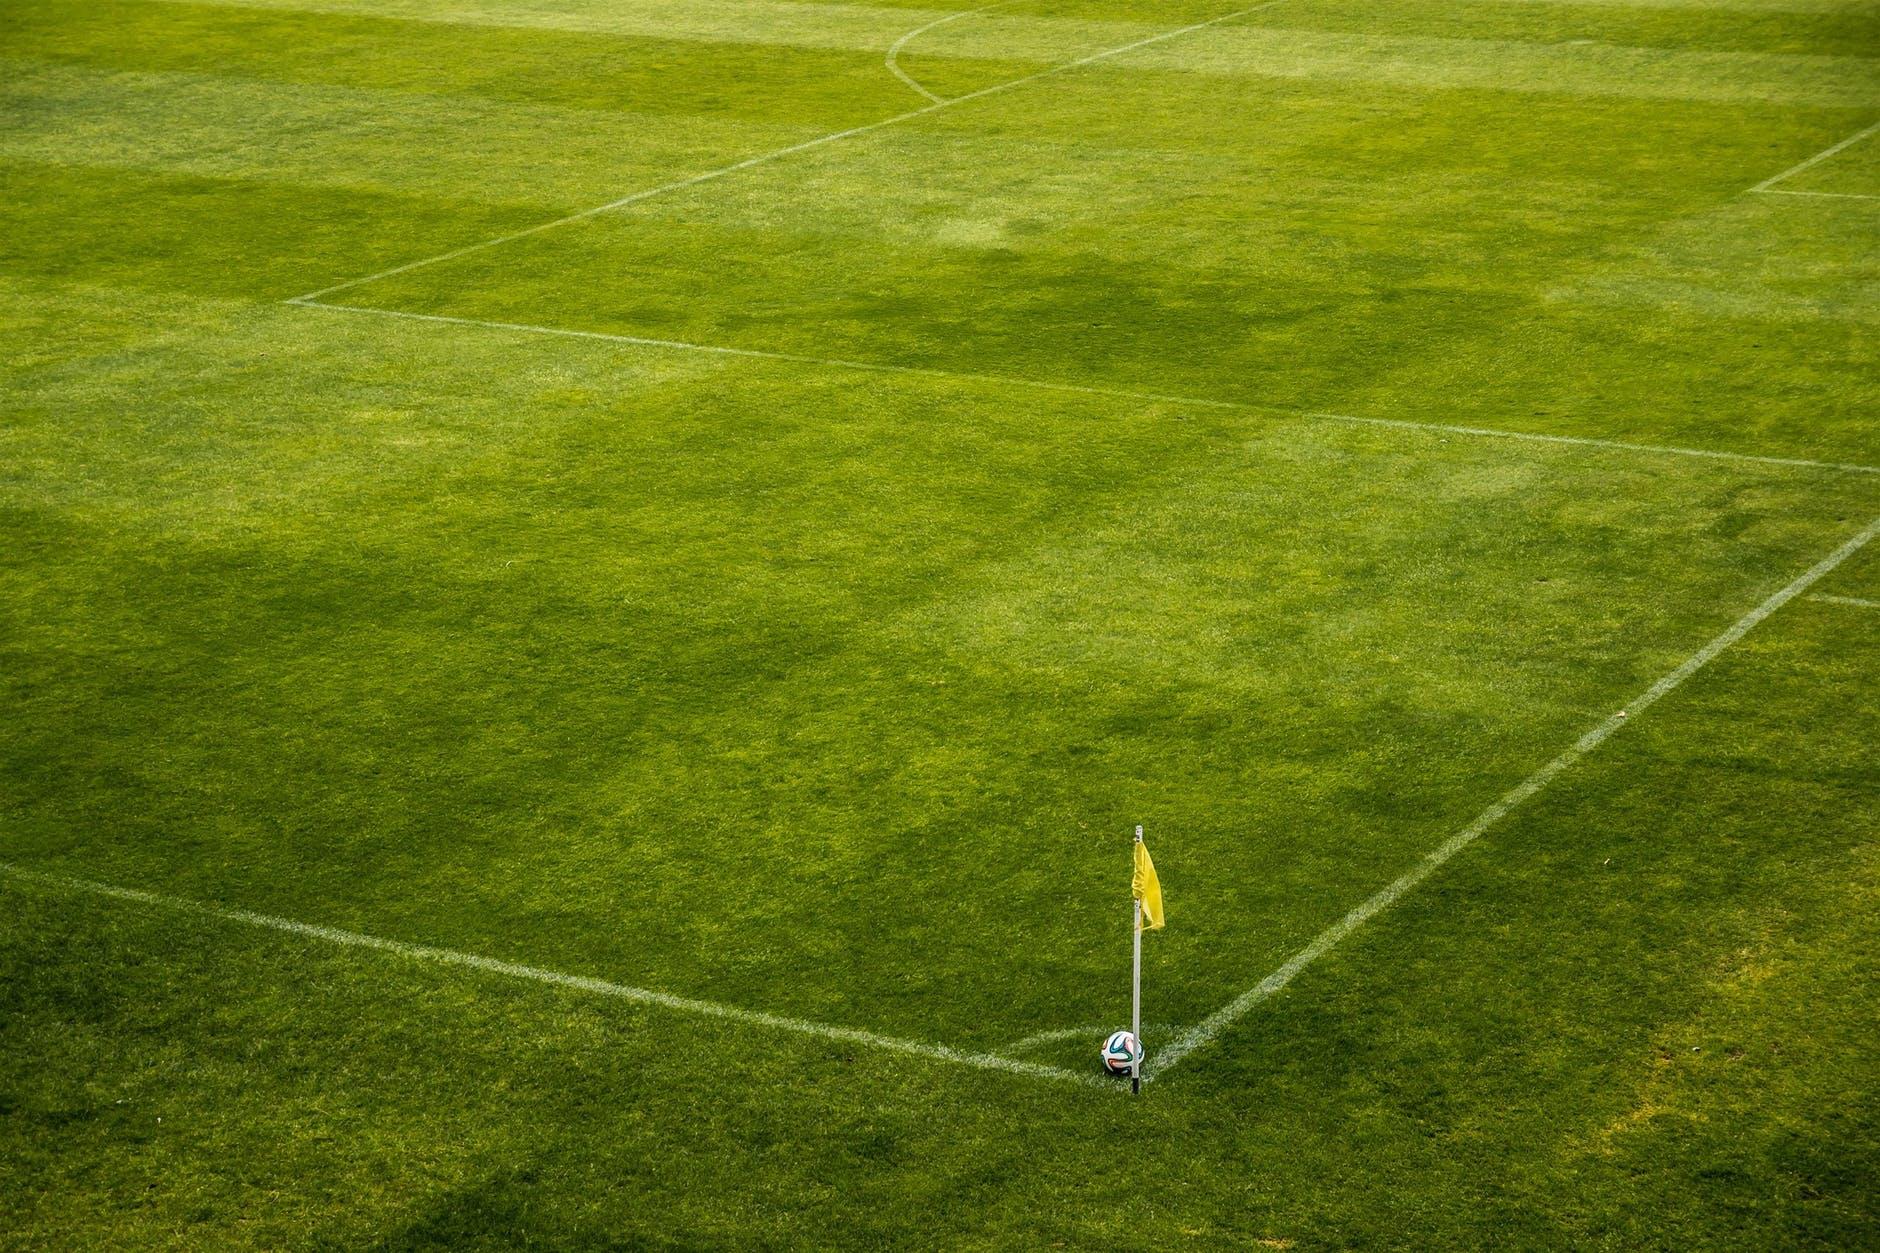 the-ball-stadion-horn-corner-47343.jpeg